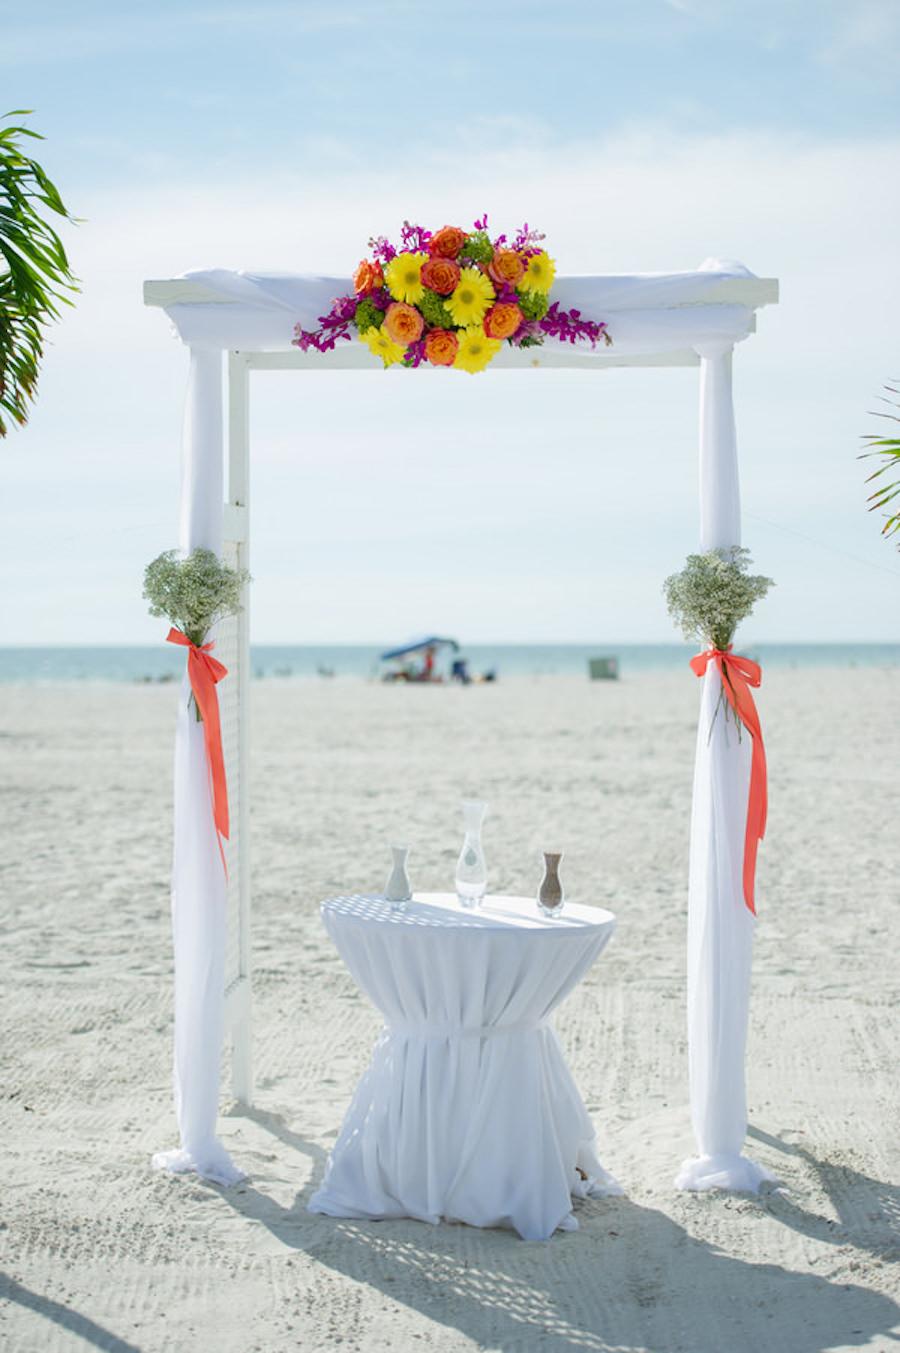 St. Pete Beach Wedding Ceremony Decor with White Wedding Altar with Bright Yellow, Orange and Purple Flowers  St. Pete Wedding Photographer Andi Diamond Photography